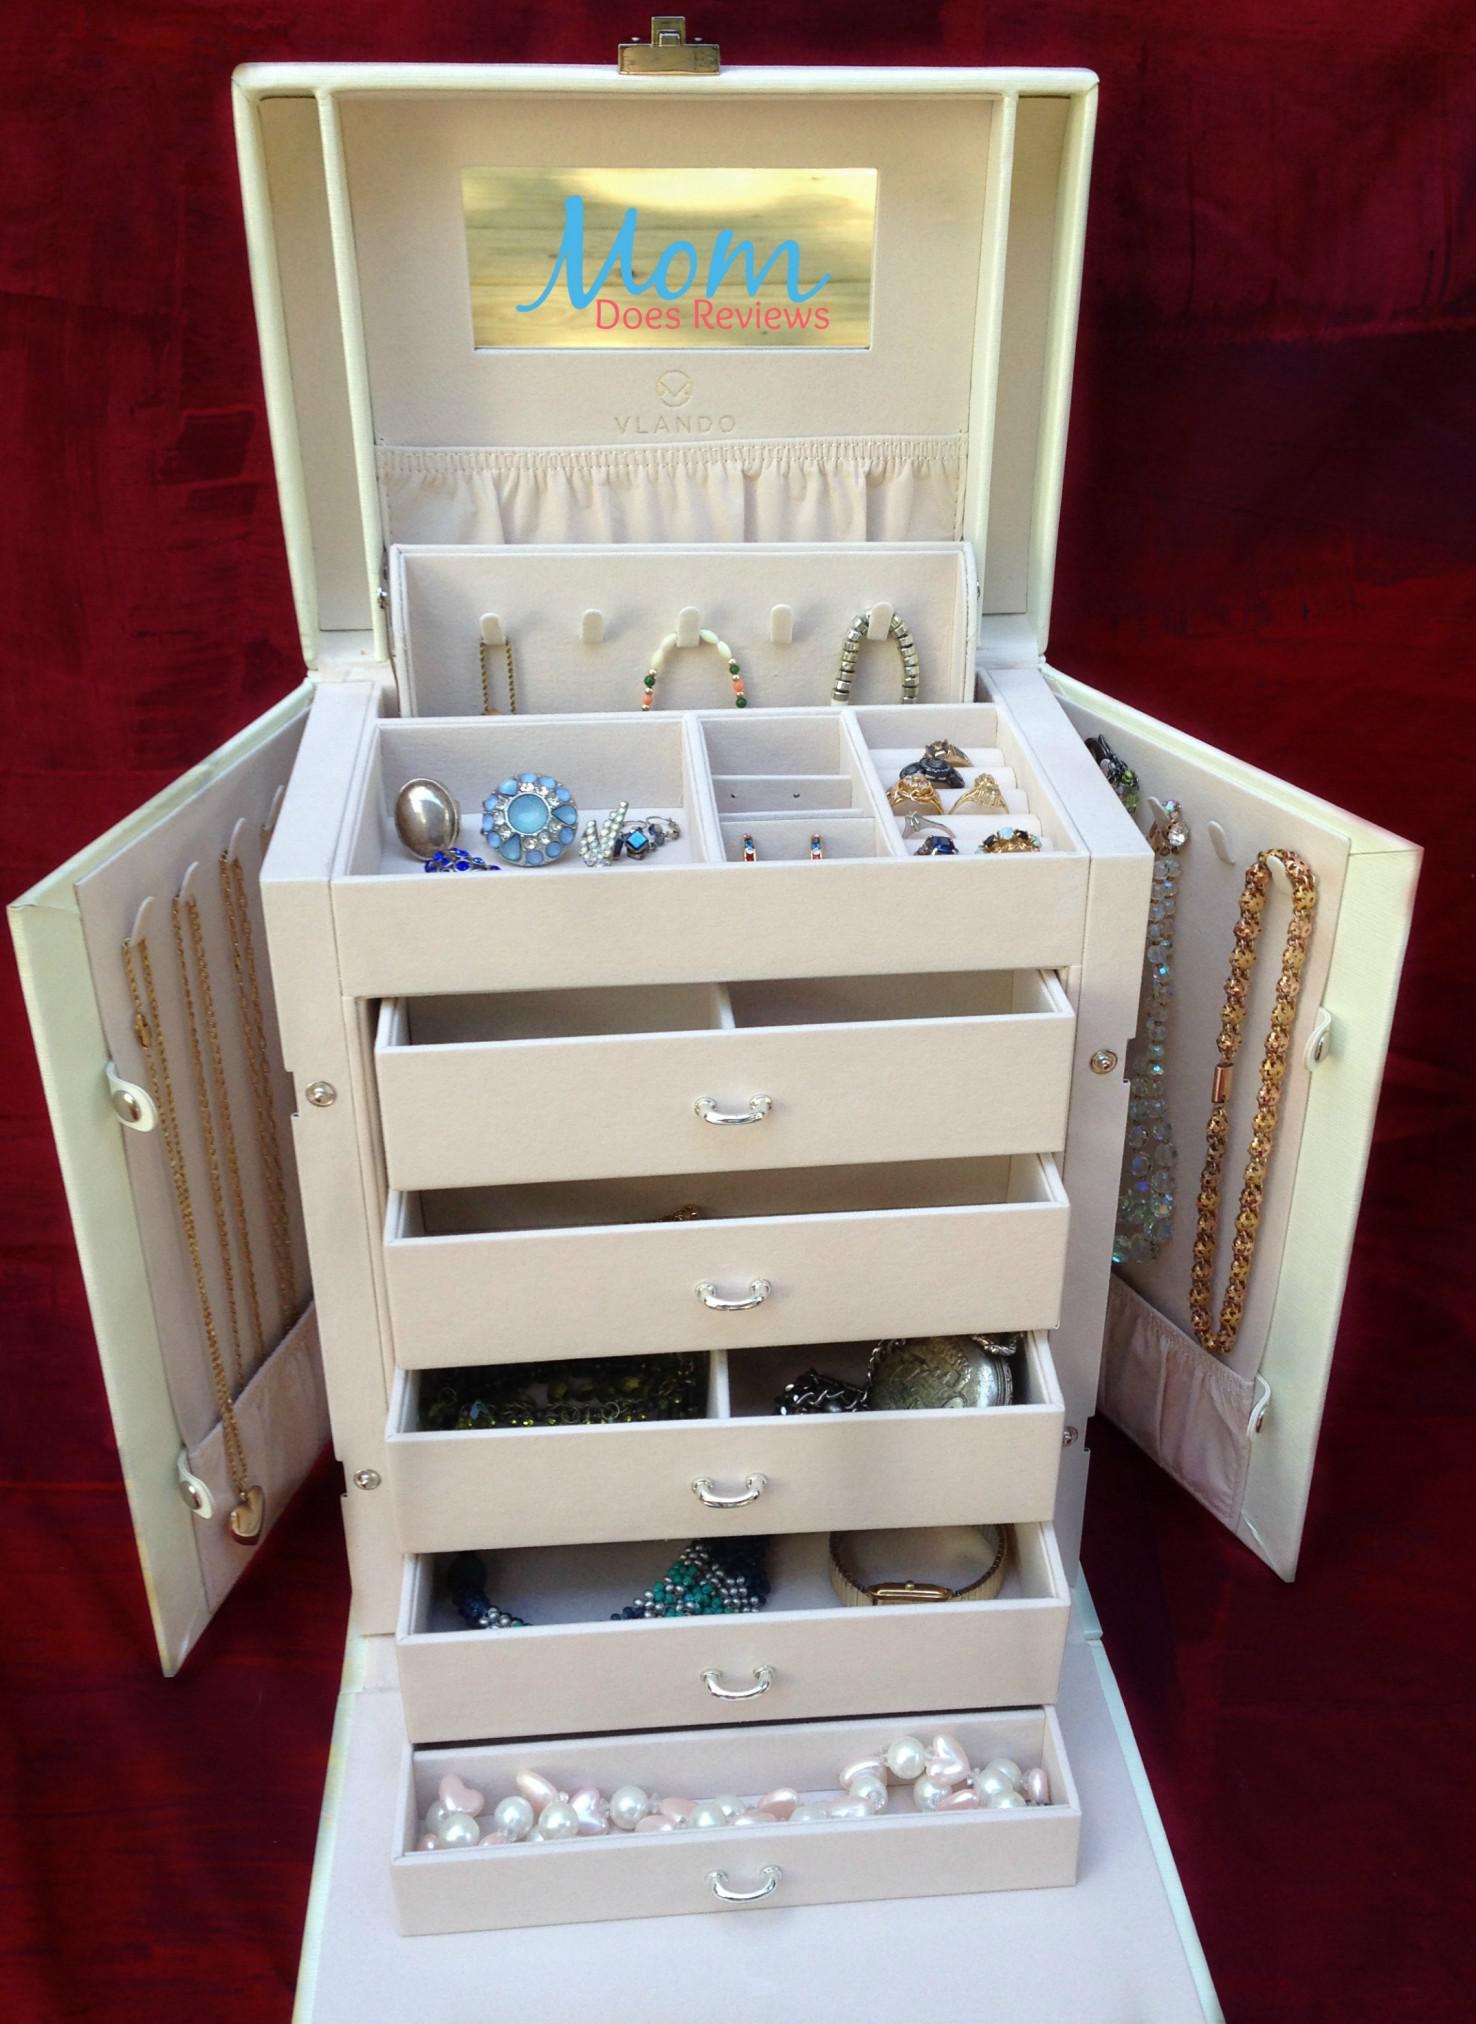 Vlando The Jewelry Box Every Woman Needs Review